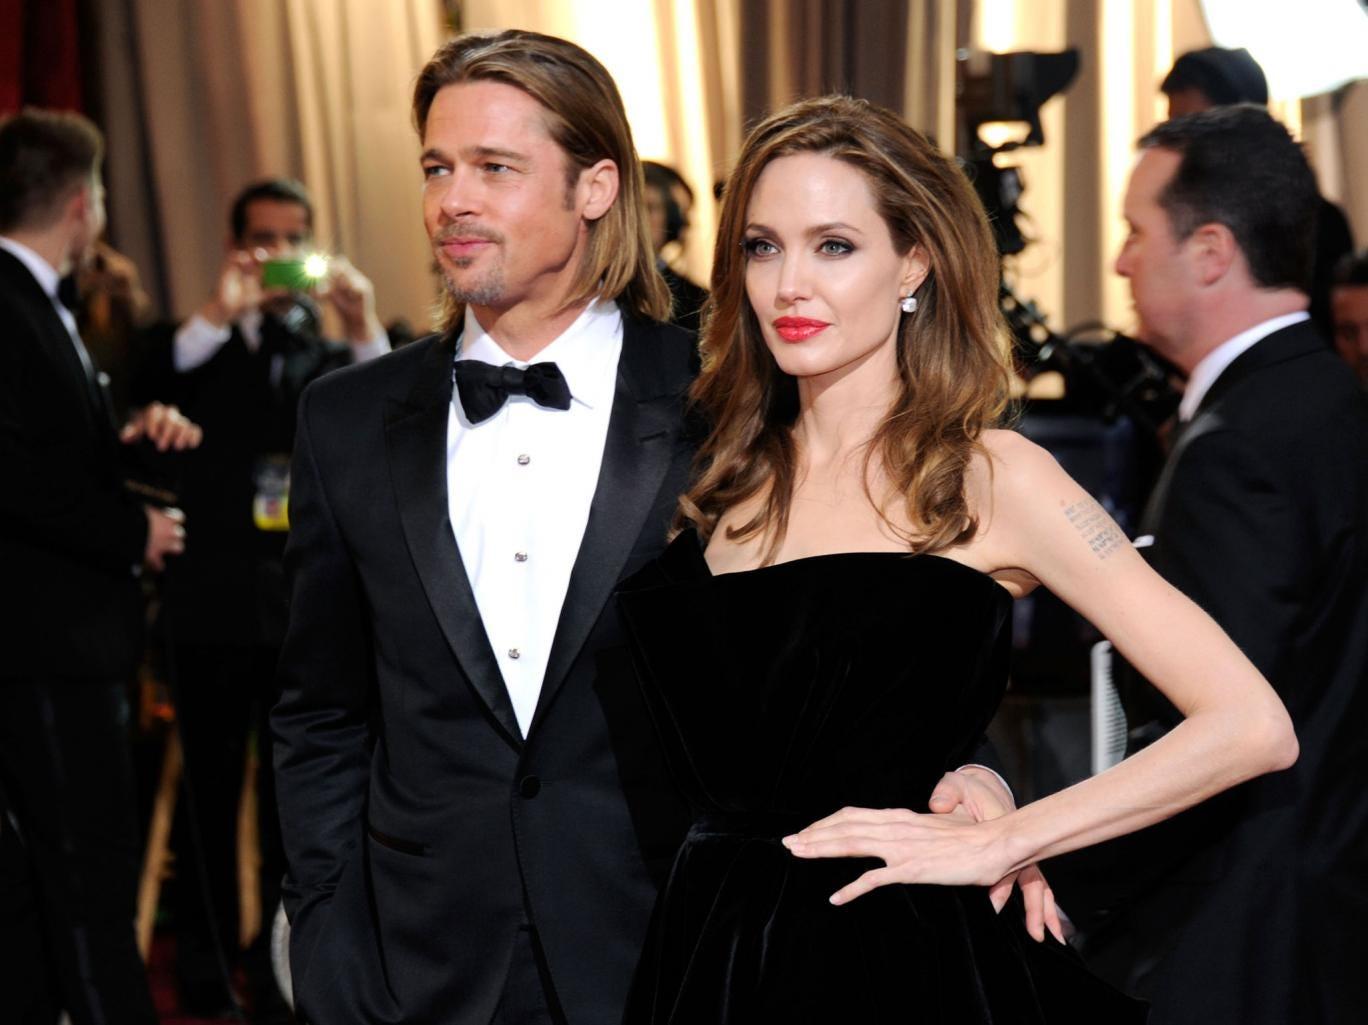 Brad Pitt and Angelina Jolie arrive at the Oscars